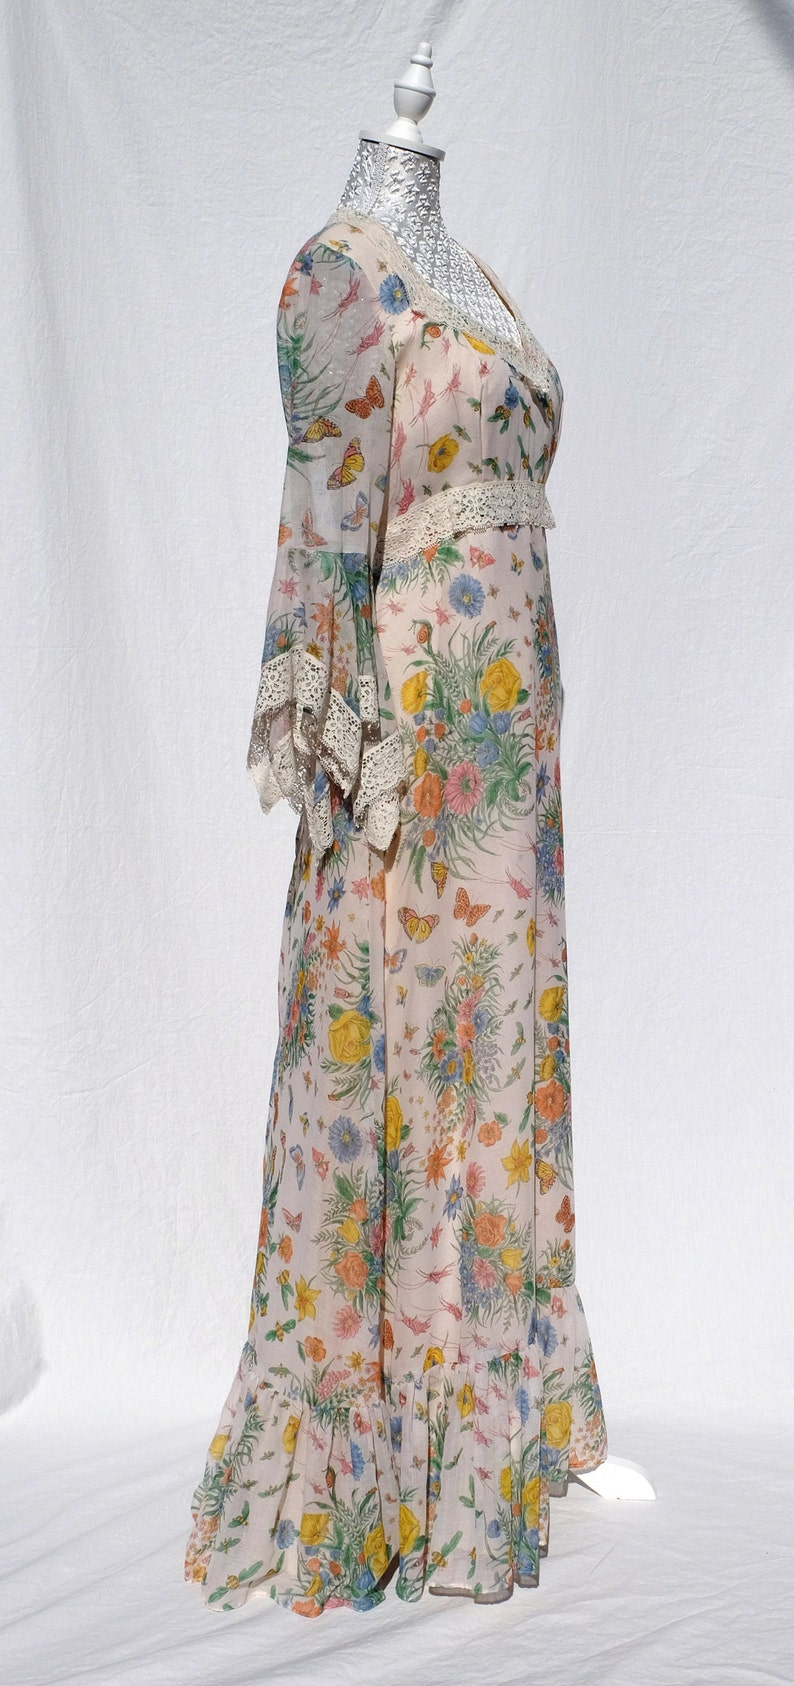 9c0a33afbf0 70s lace flower garden butterfly maxi dress  spring dress